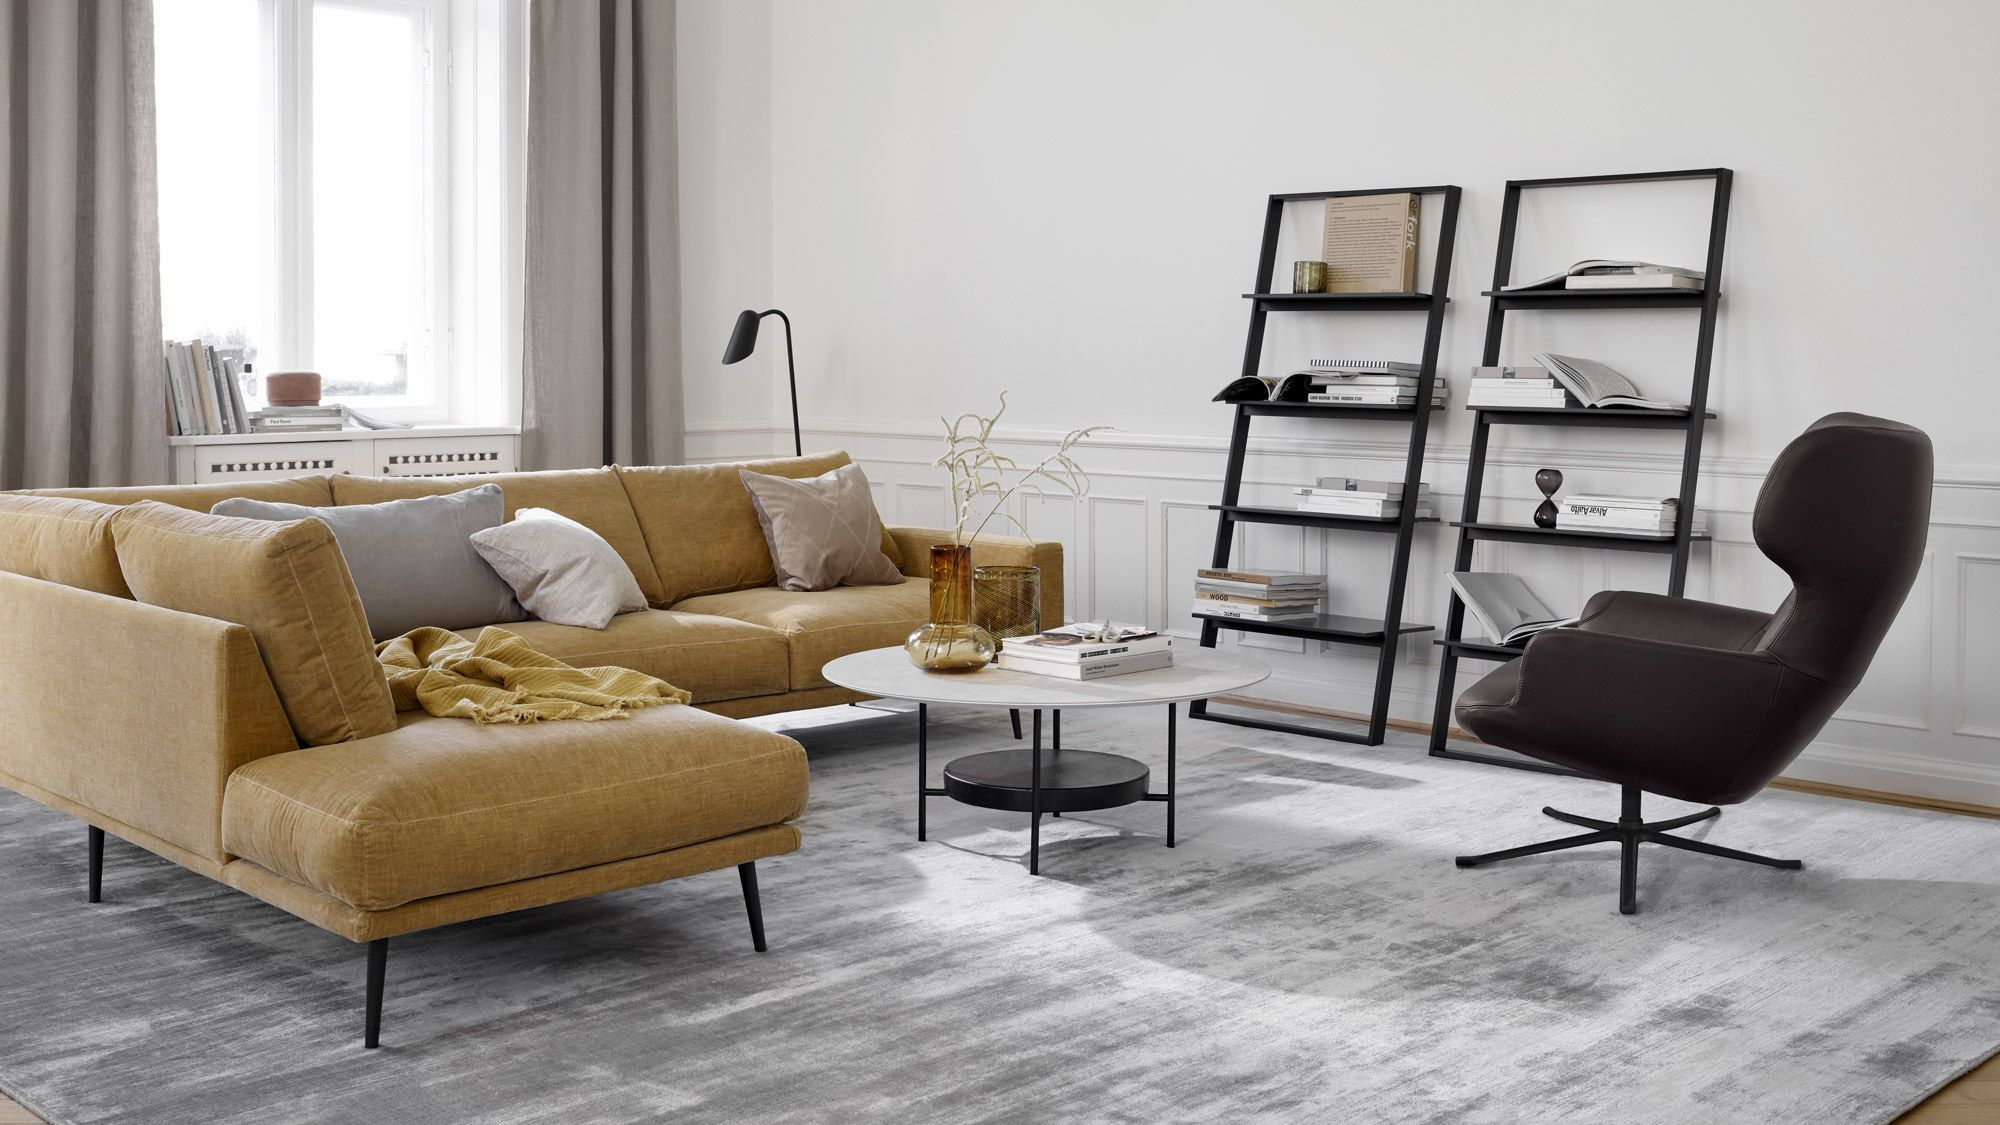 Trento Chair With Swivel Function Living Room Scandinavian